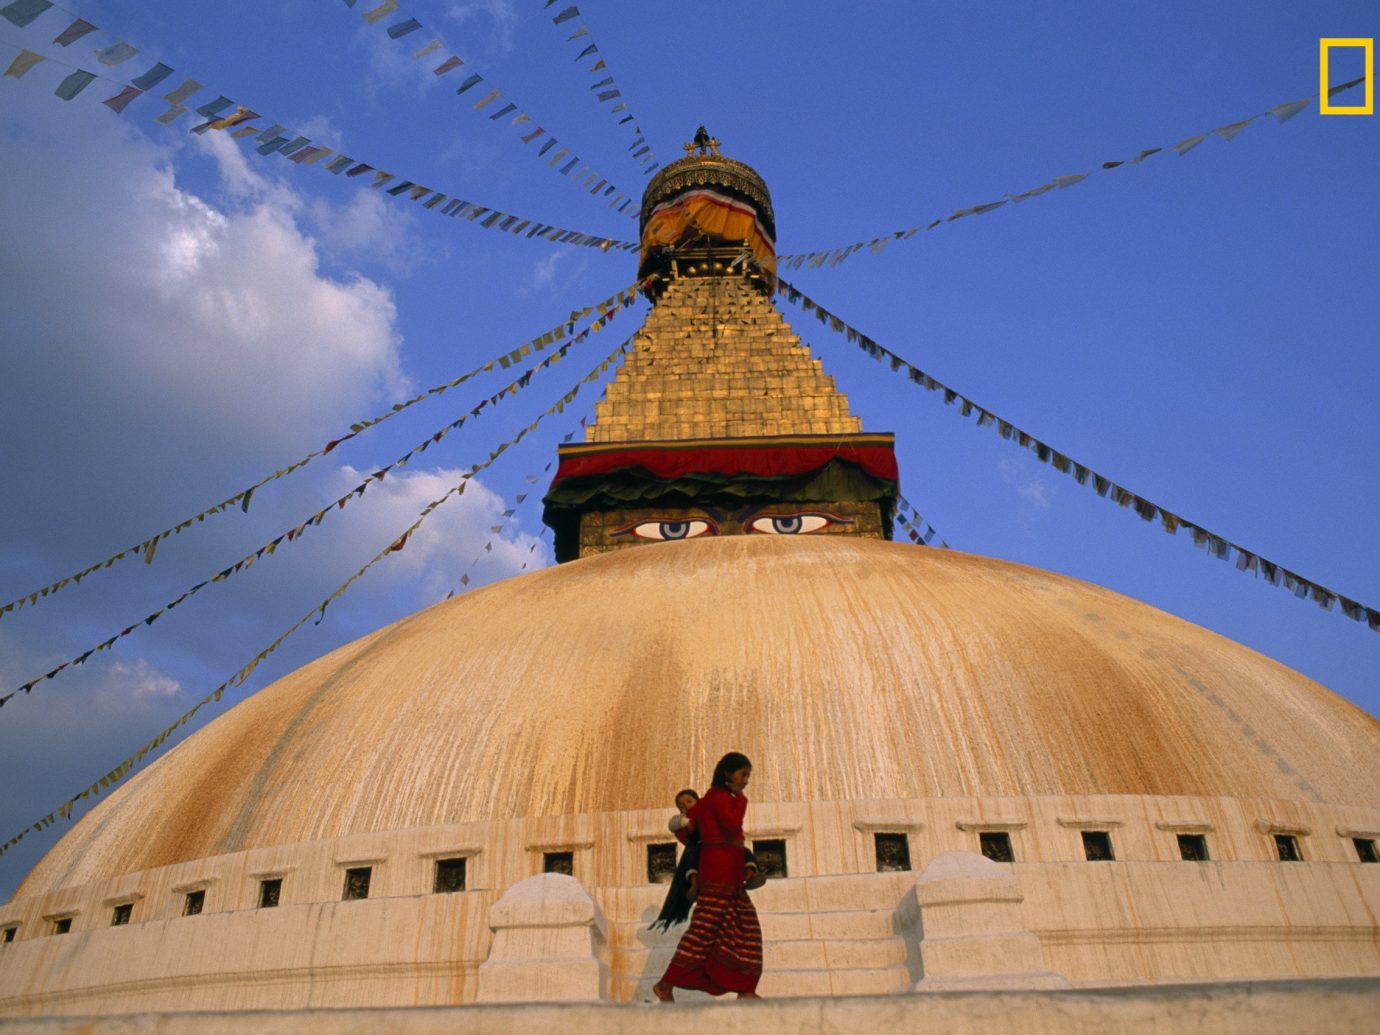 Health + Wellness Scuba Diving + Snorkeling Trip Ideas sky building outdoor dome stupa landmark tower place of worship temple